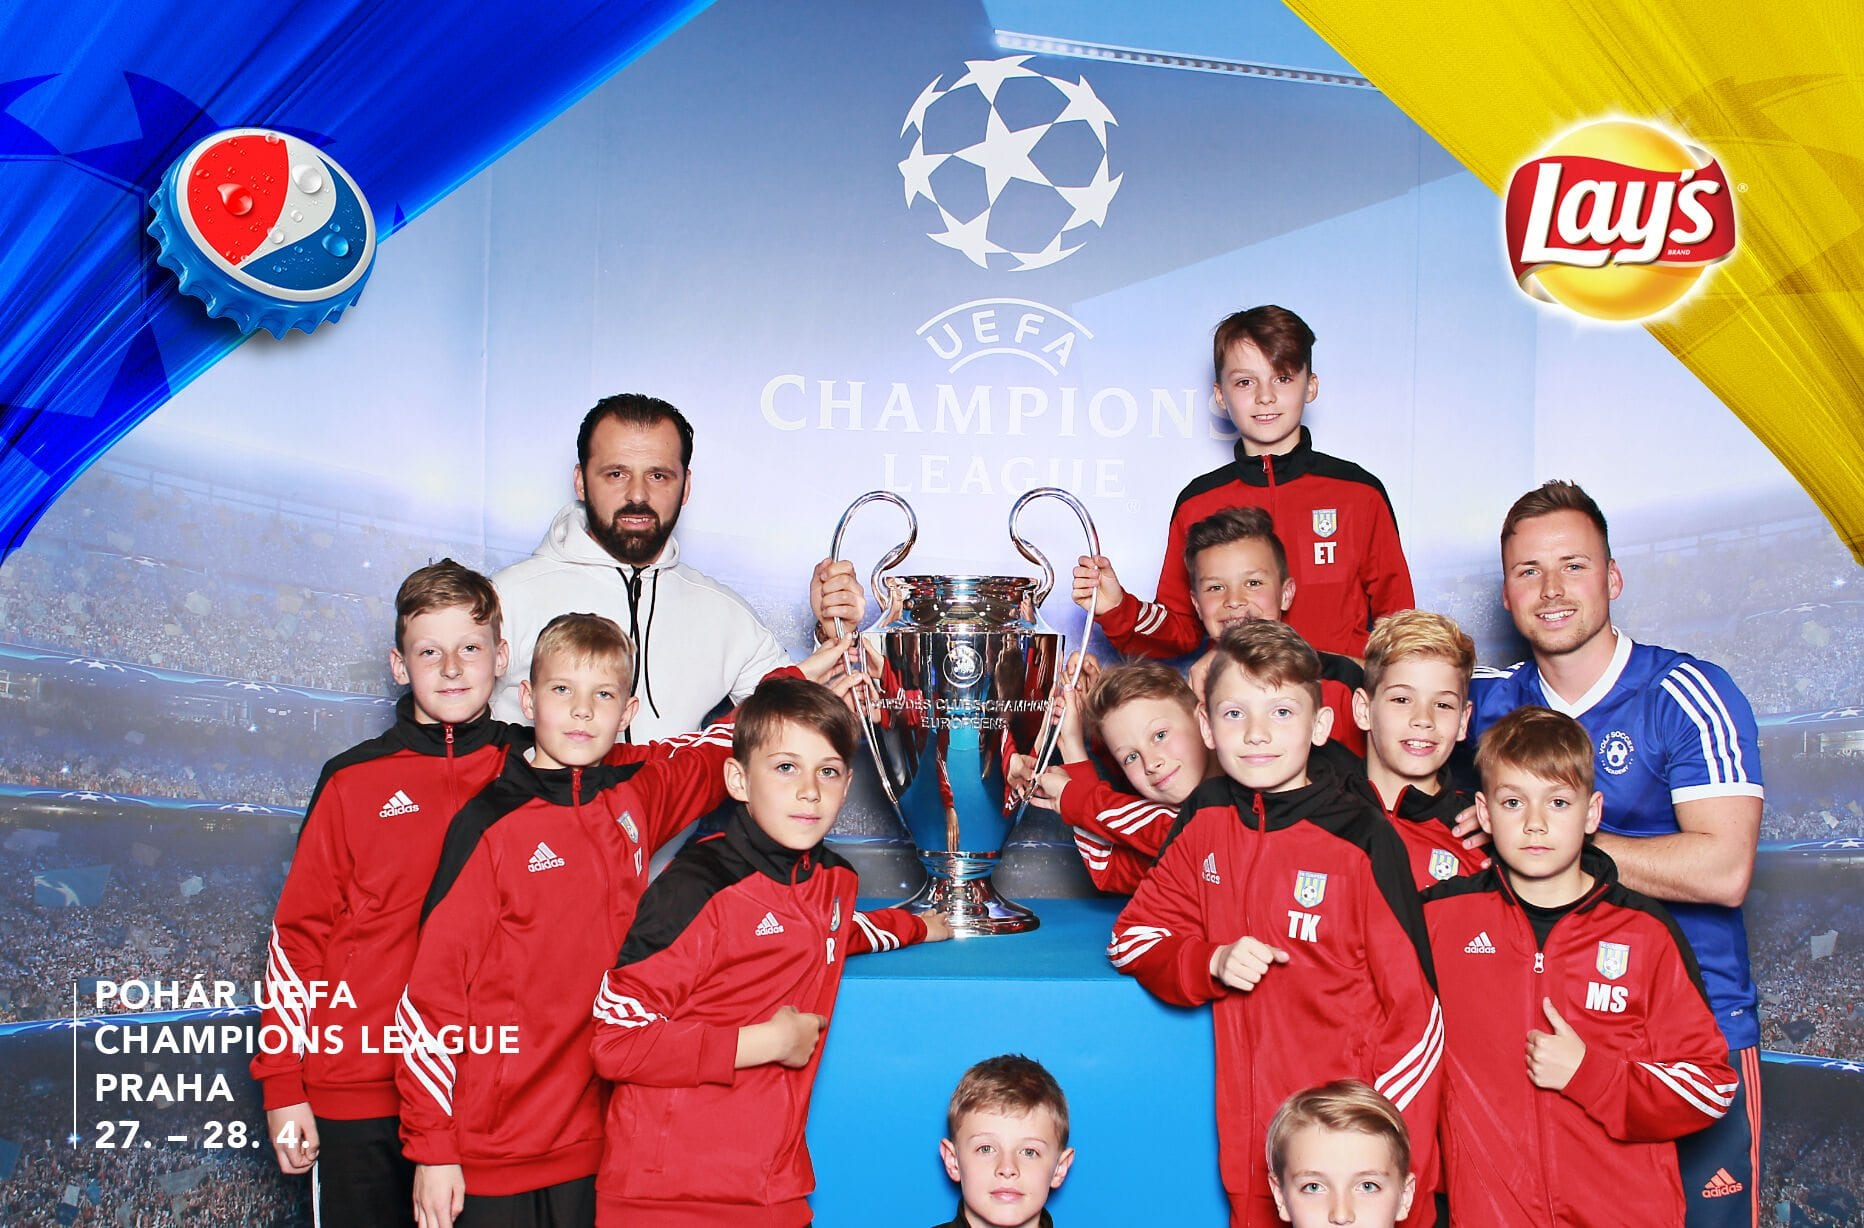 fotokoutek-uefa-28-4-2017-2-241684